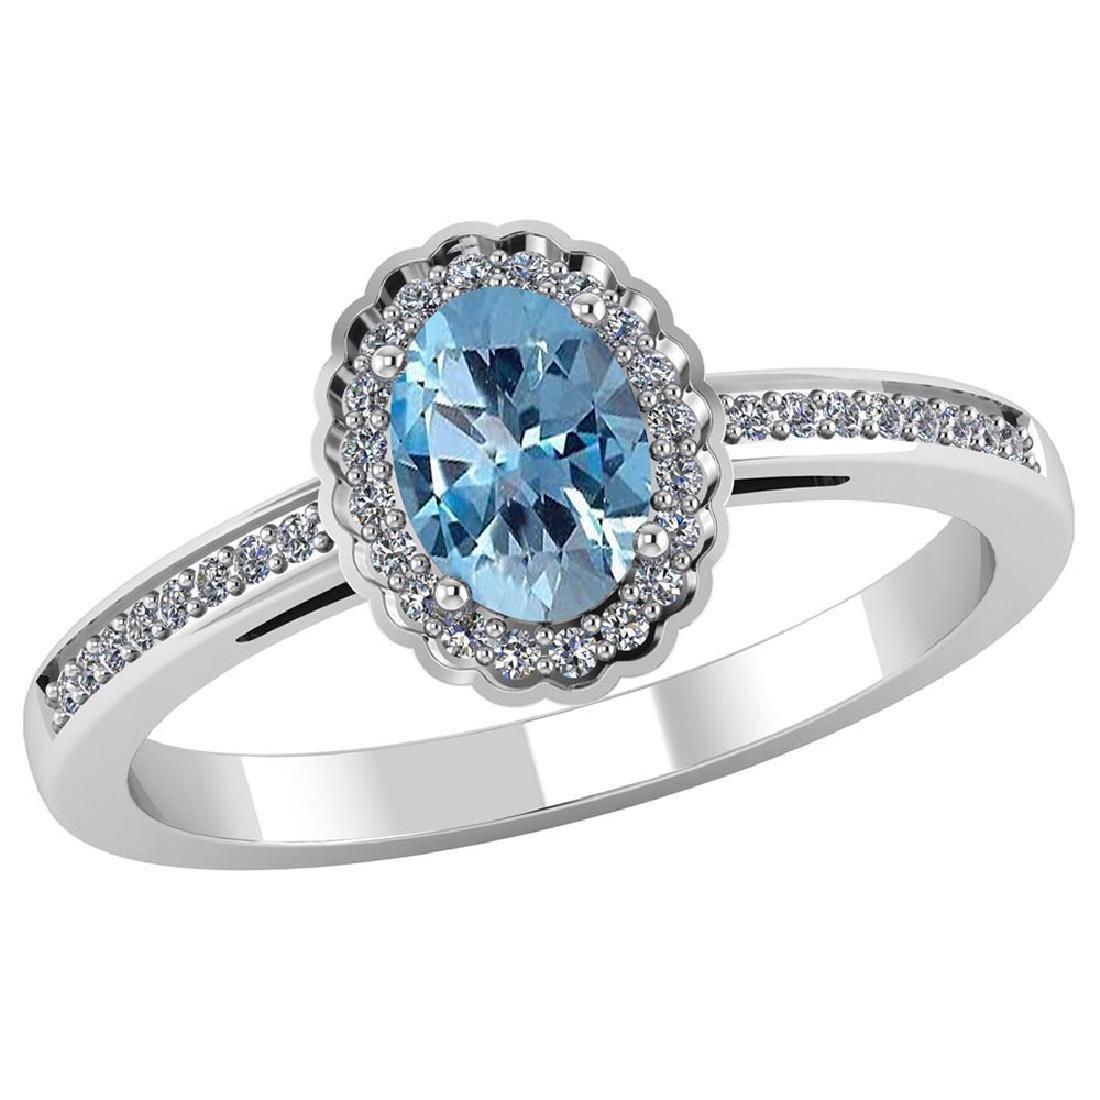 Certified 1.50 CTW Genuine Aquamarine And Diamond 14K W